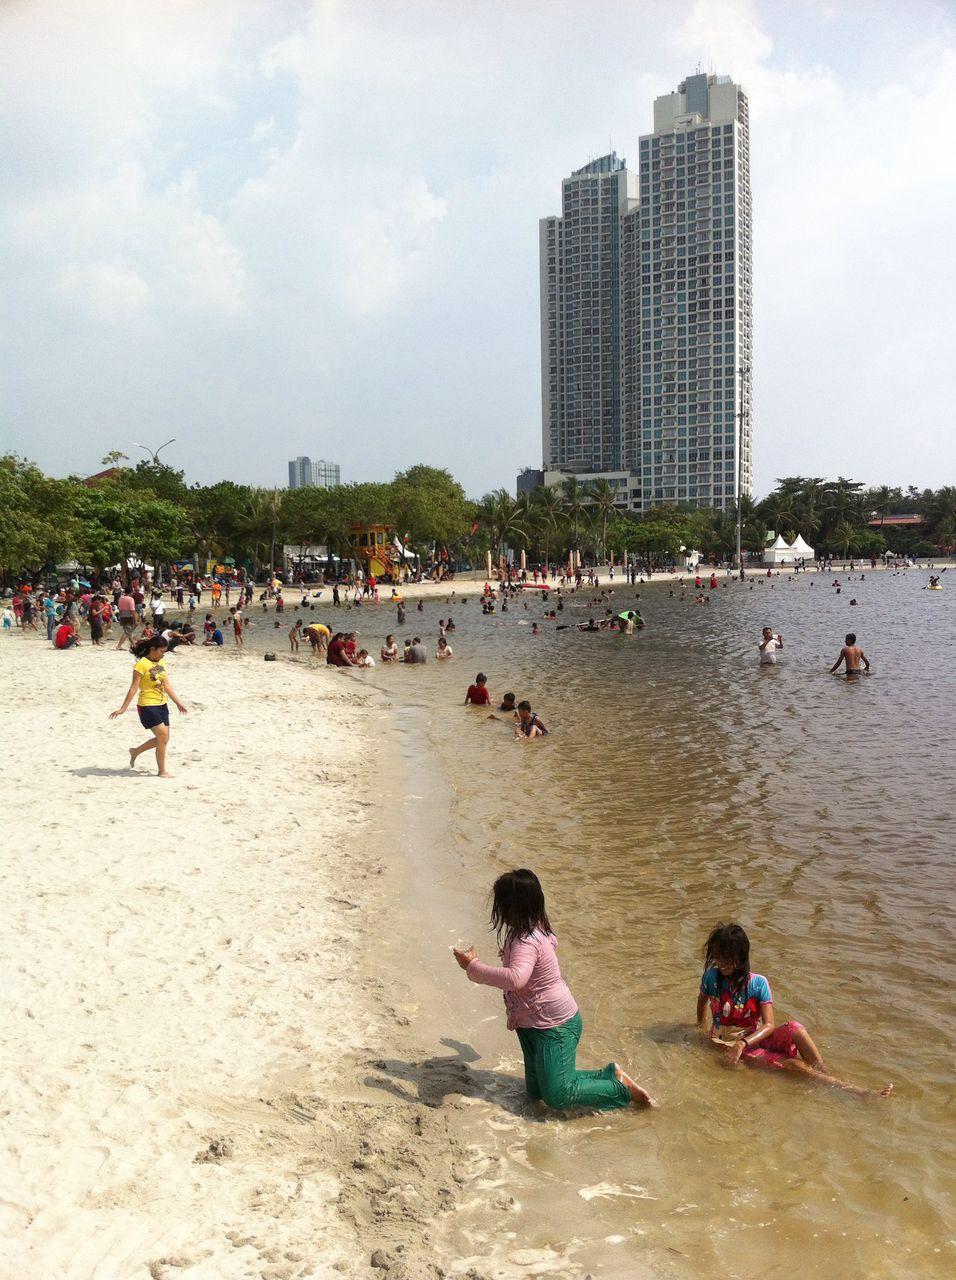 Pantai Ancol Jakarta Sehari Menjelang Lebaran Vibizmedia Com